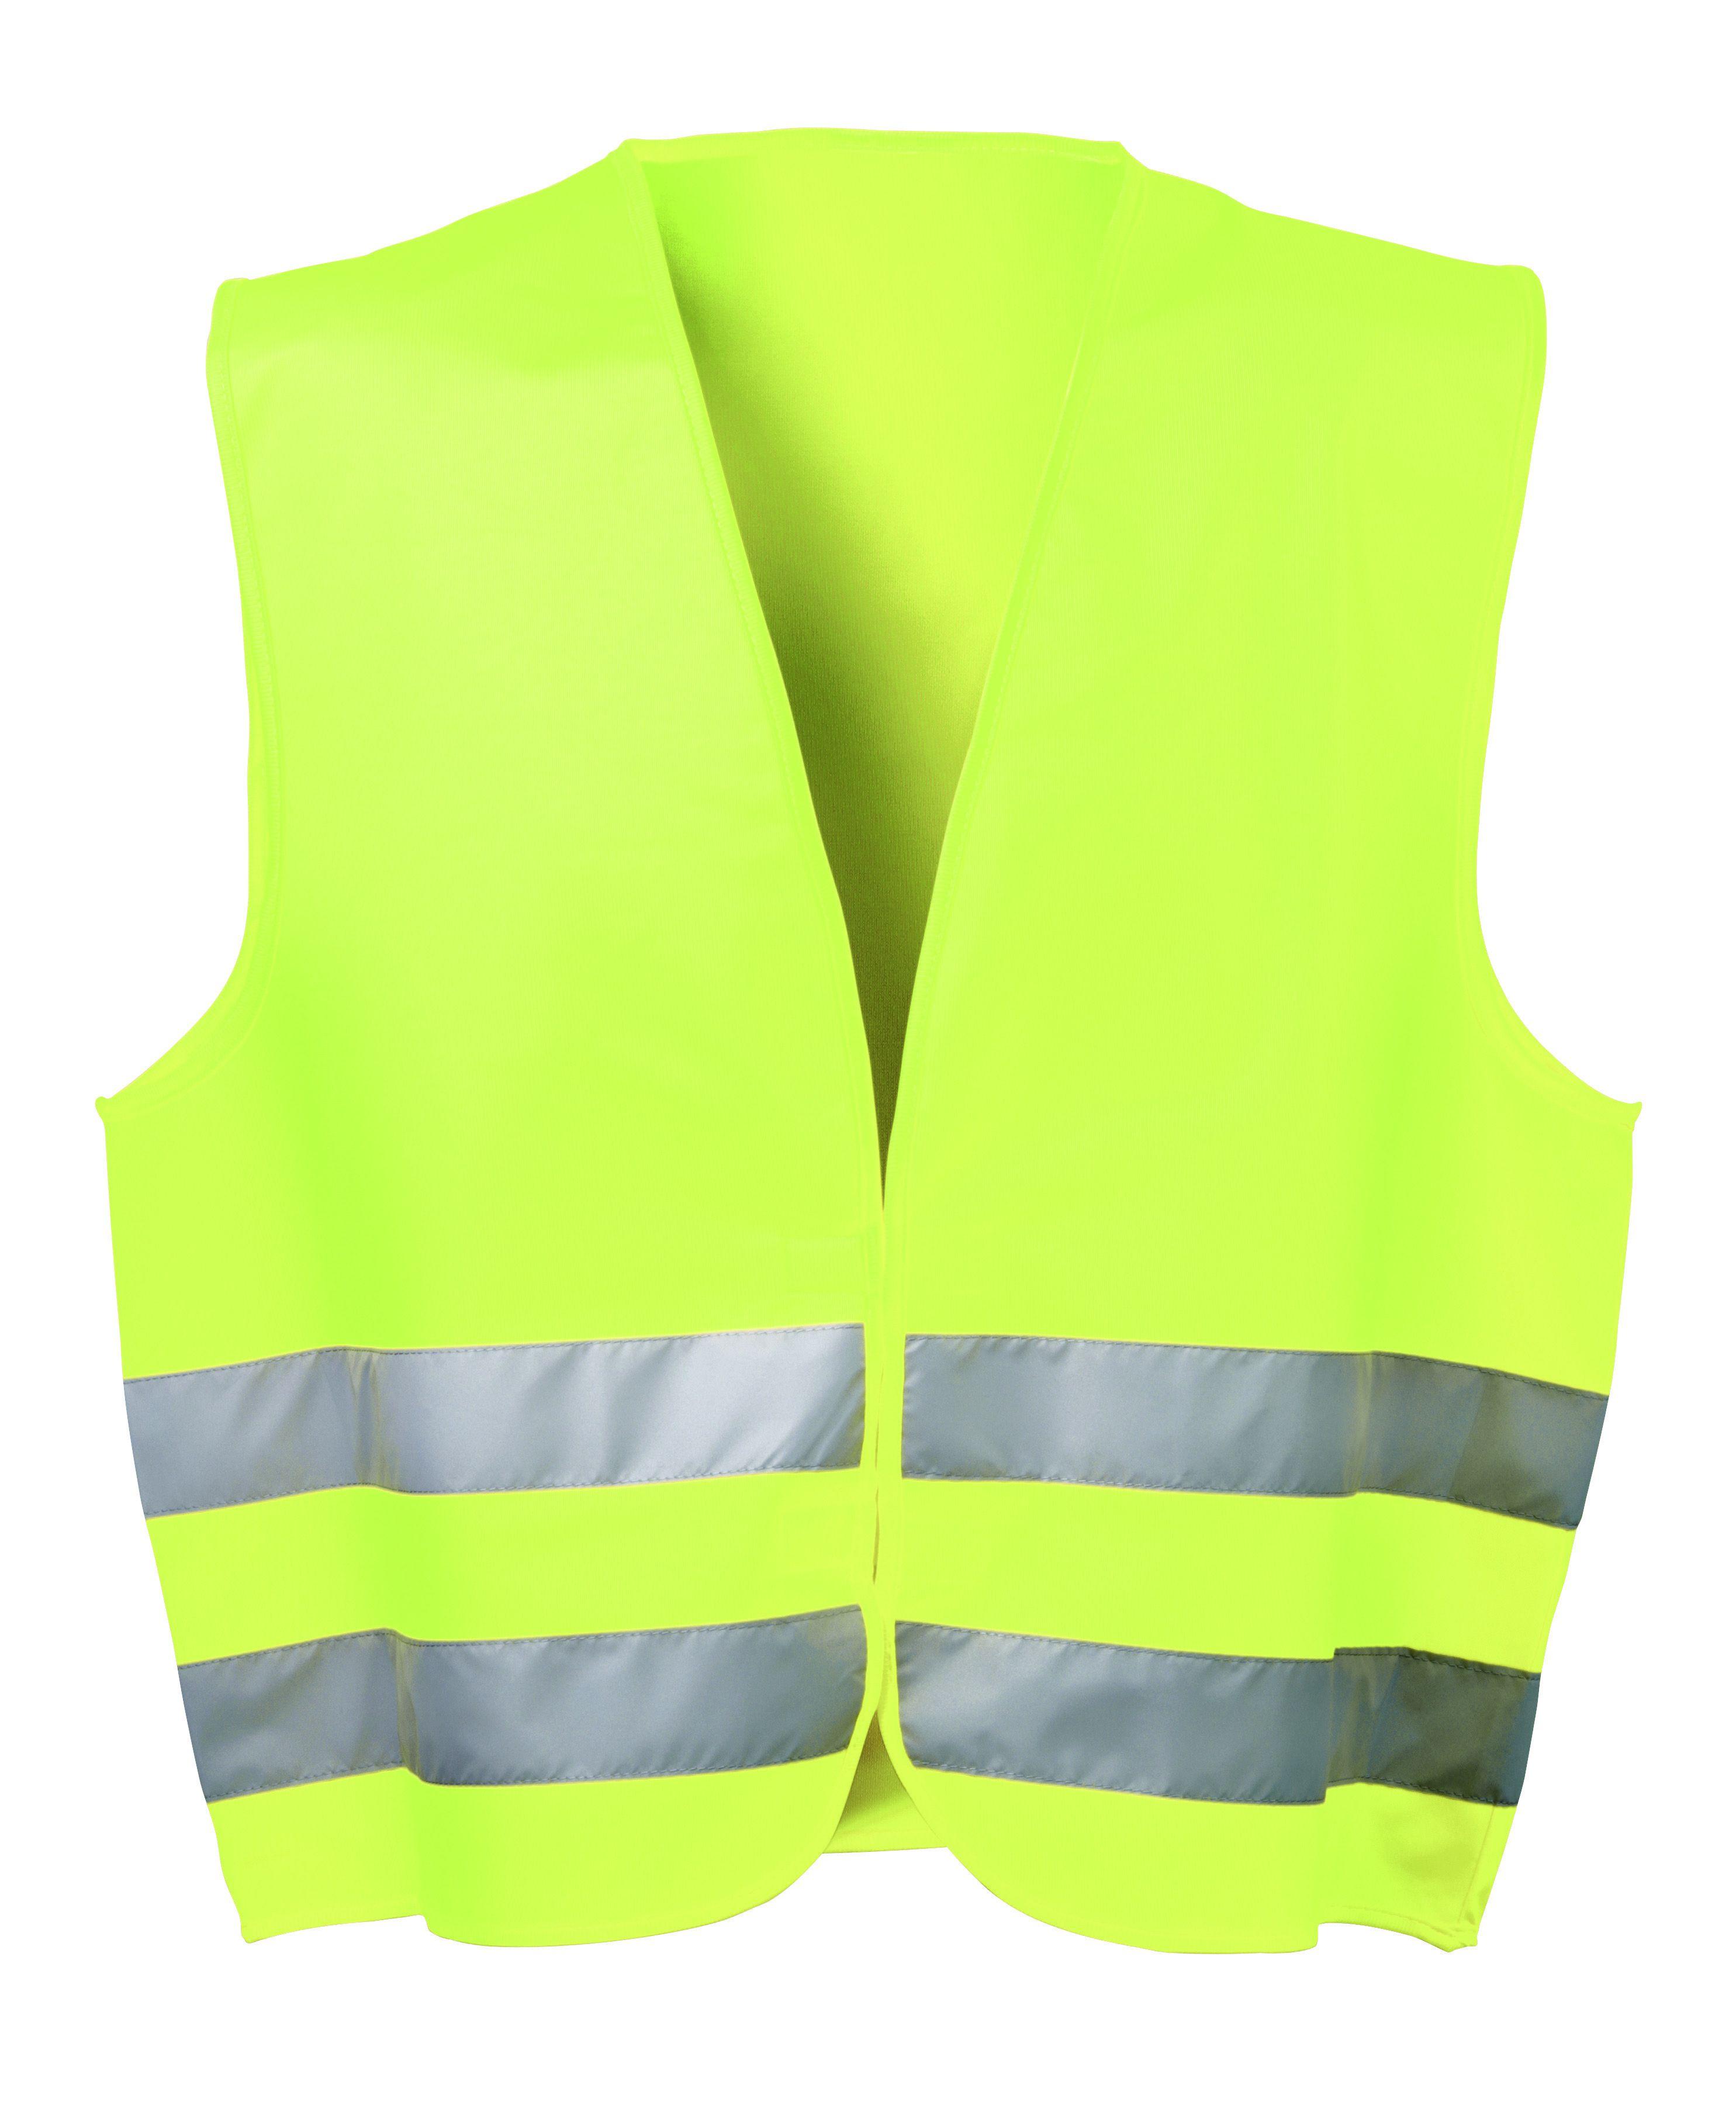 Warnweste, Klettverschluß, fluorgelb,EN ISO 20471/2, IM PE-BEUTEL, KLETT